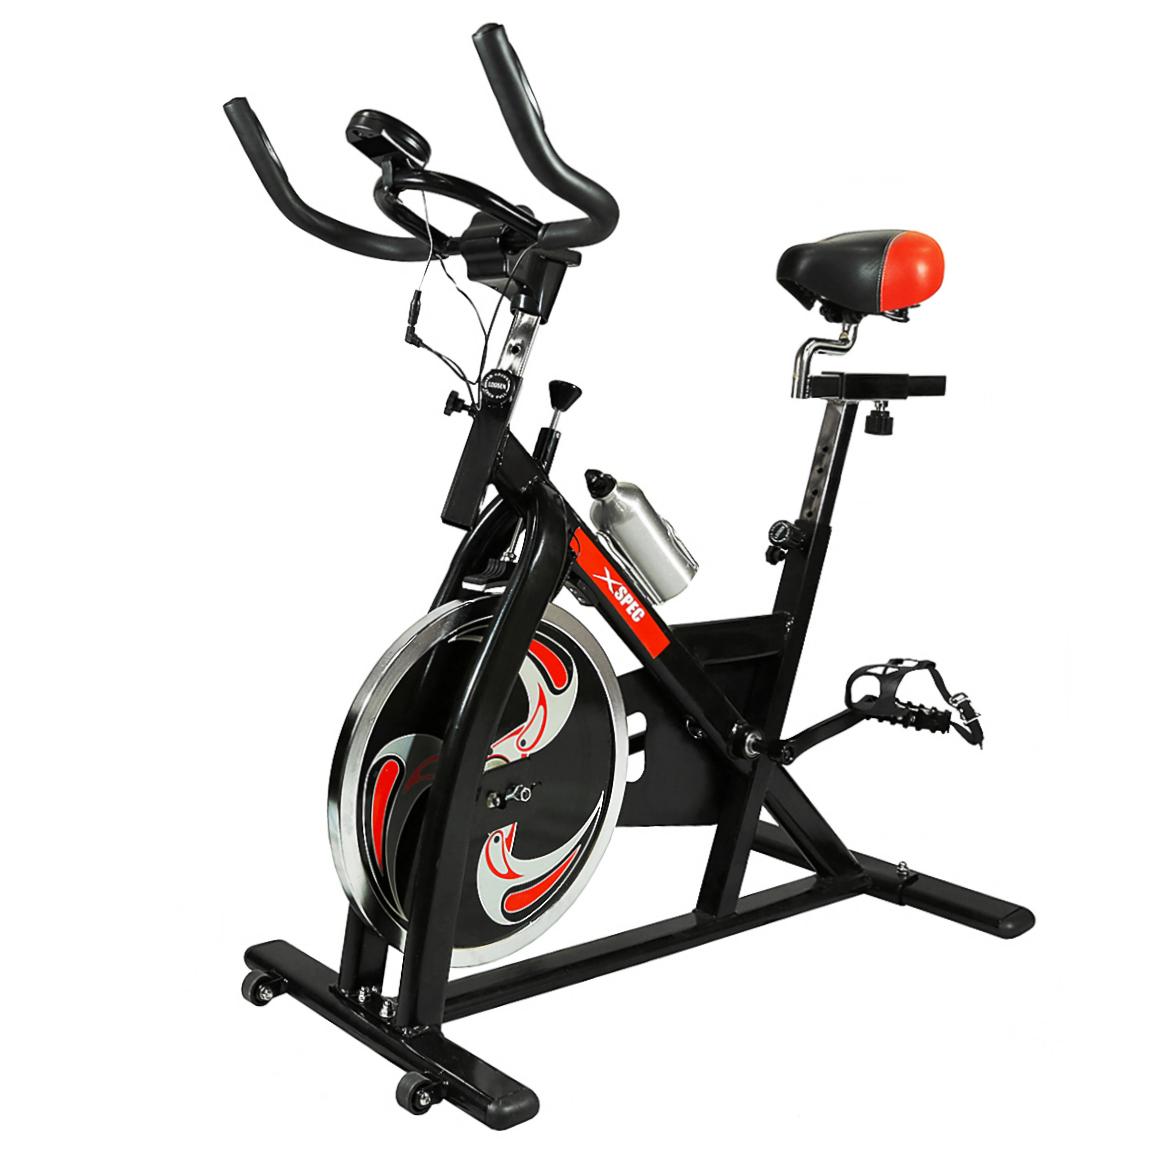 Exercise Bike Next Day Delivery: NEW Xspec Pro Stationary Upright Exercise Bike Indoor